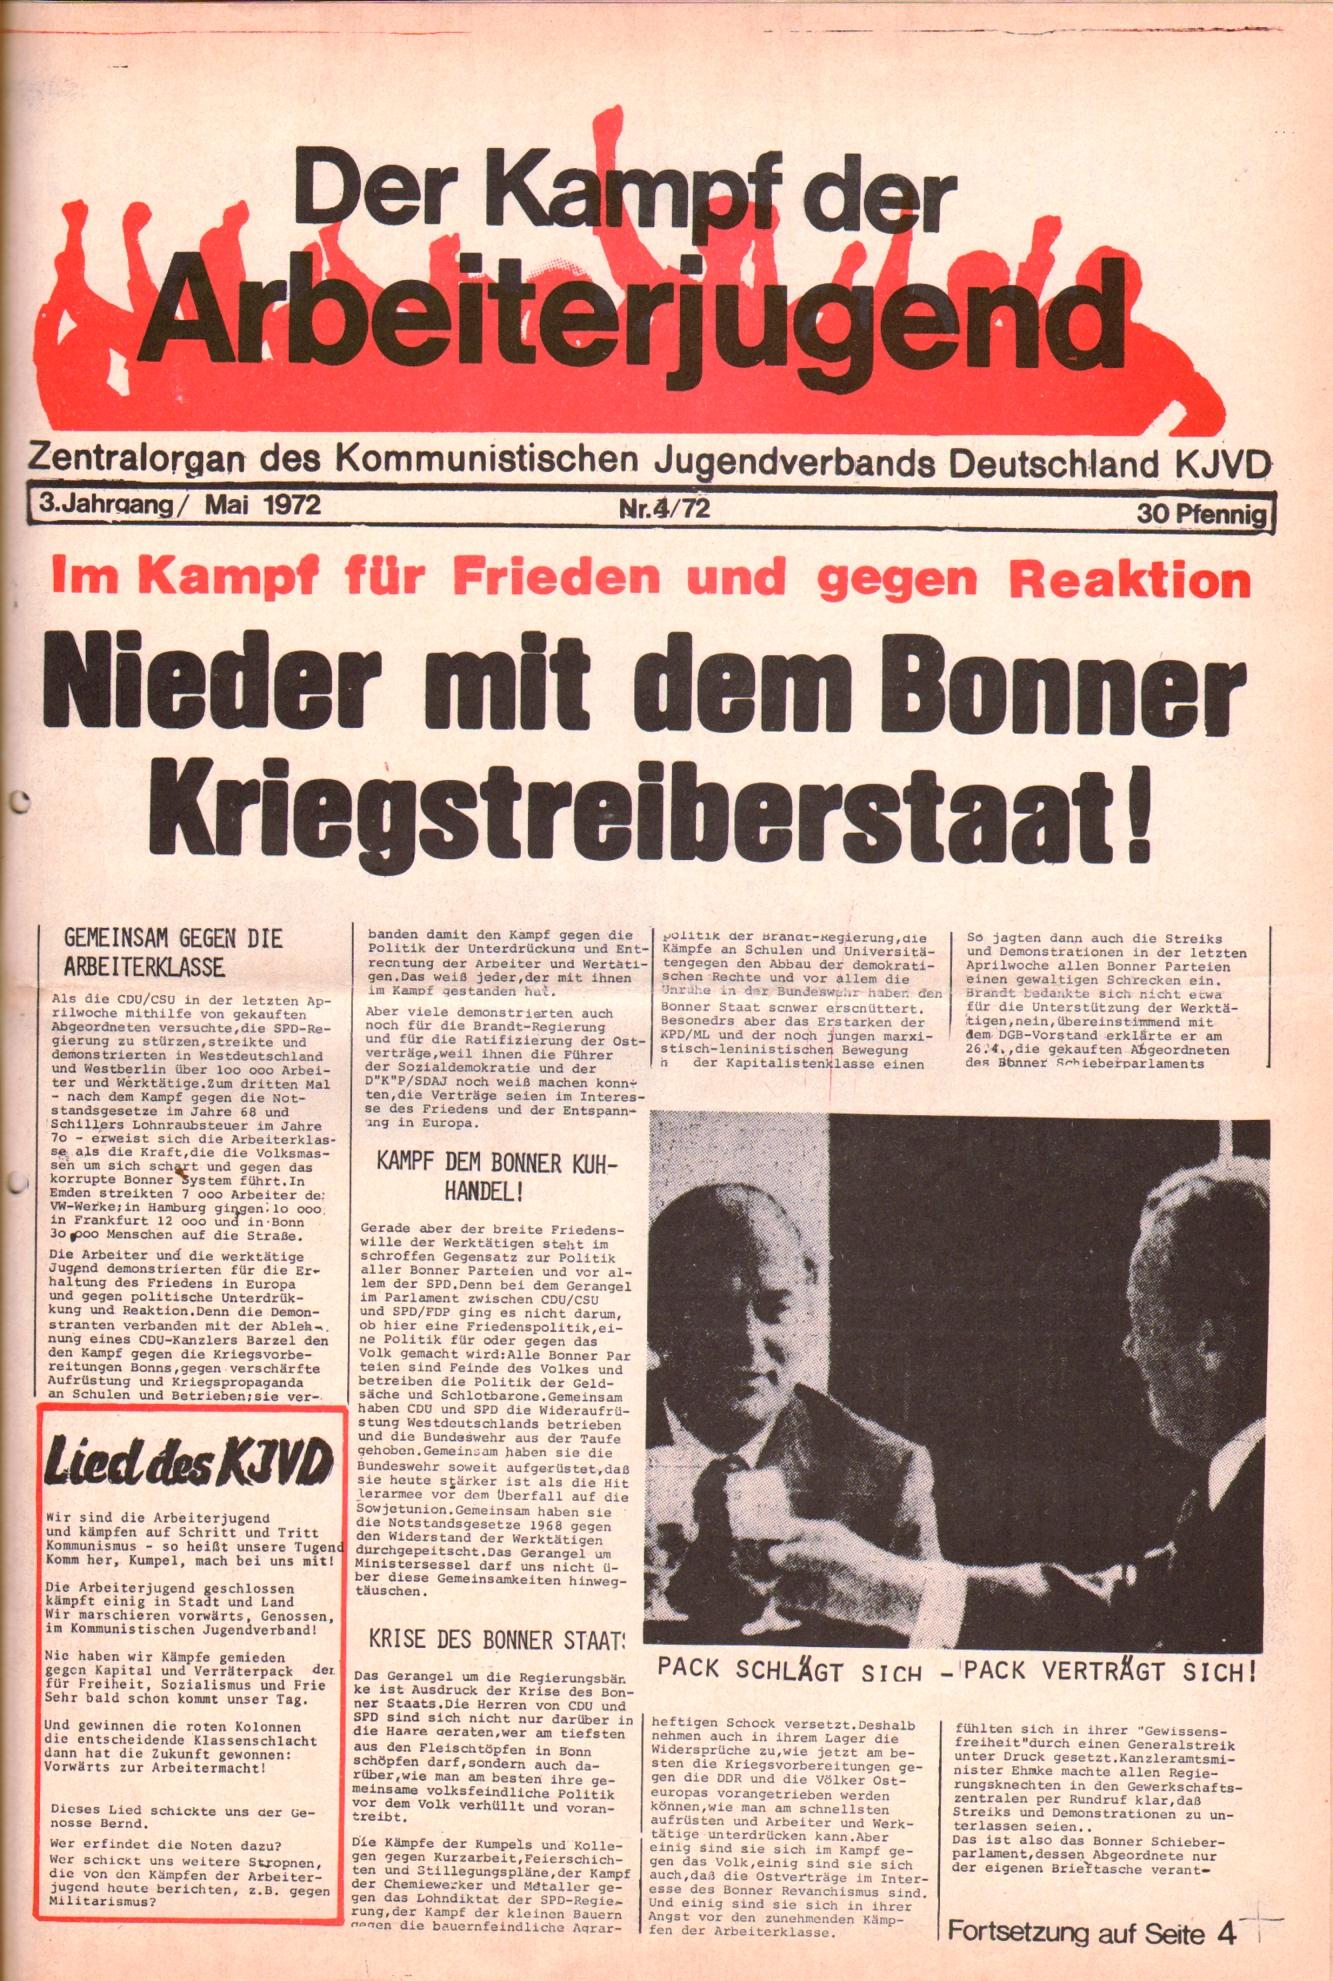 KDAJ, 3. Jg., Mai 1972, Nr. 4, Seite 1